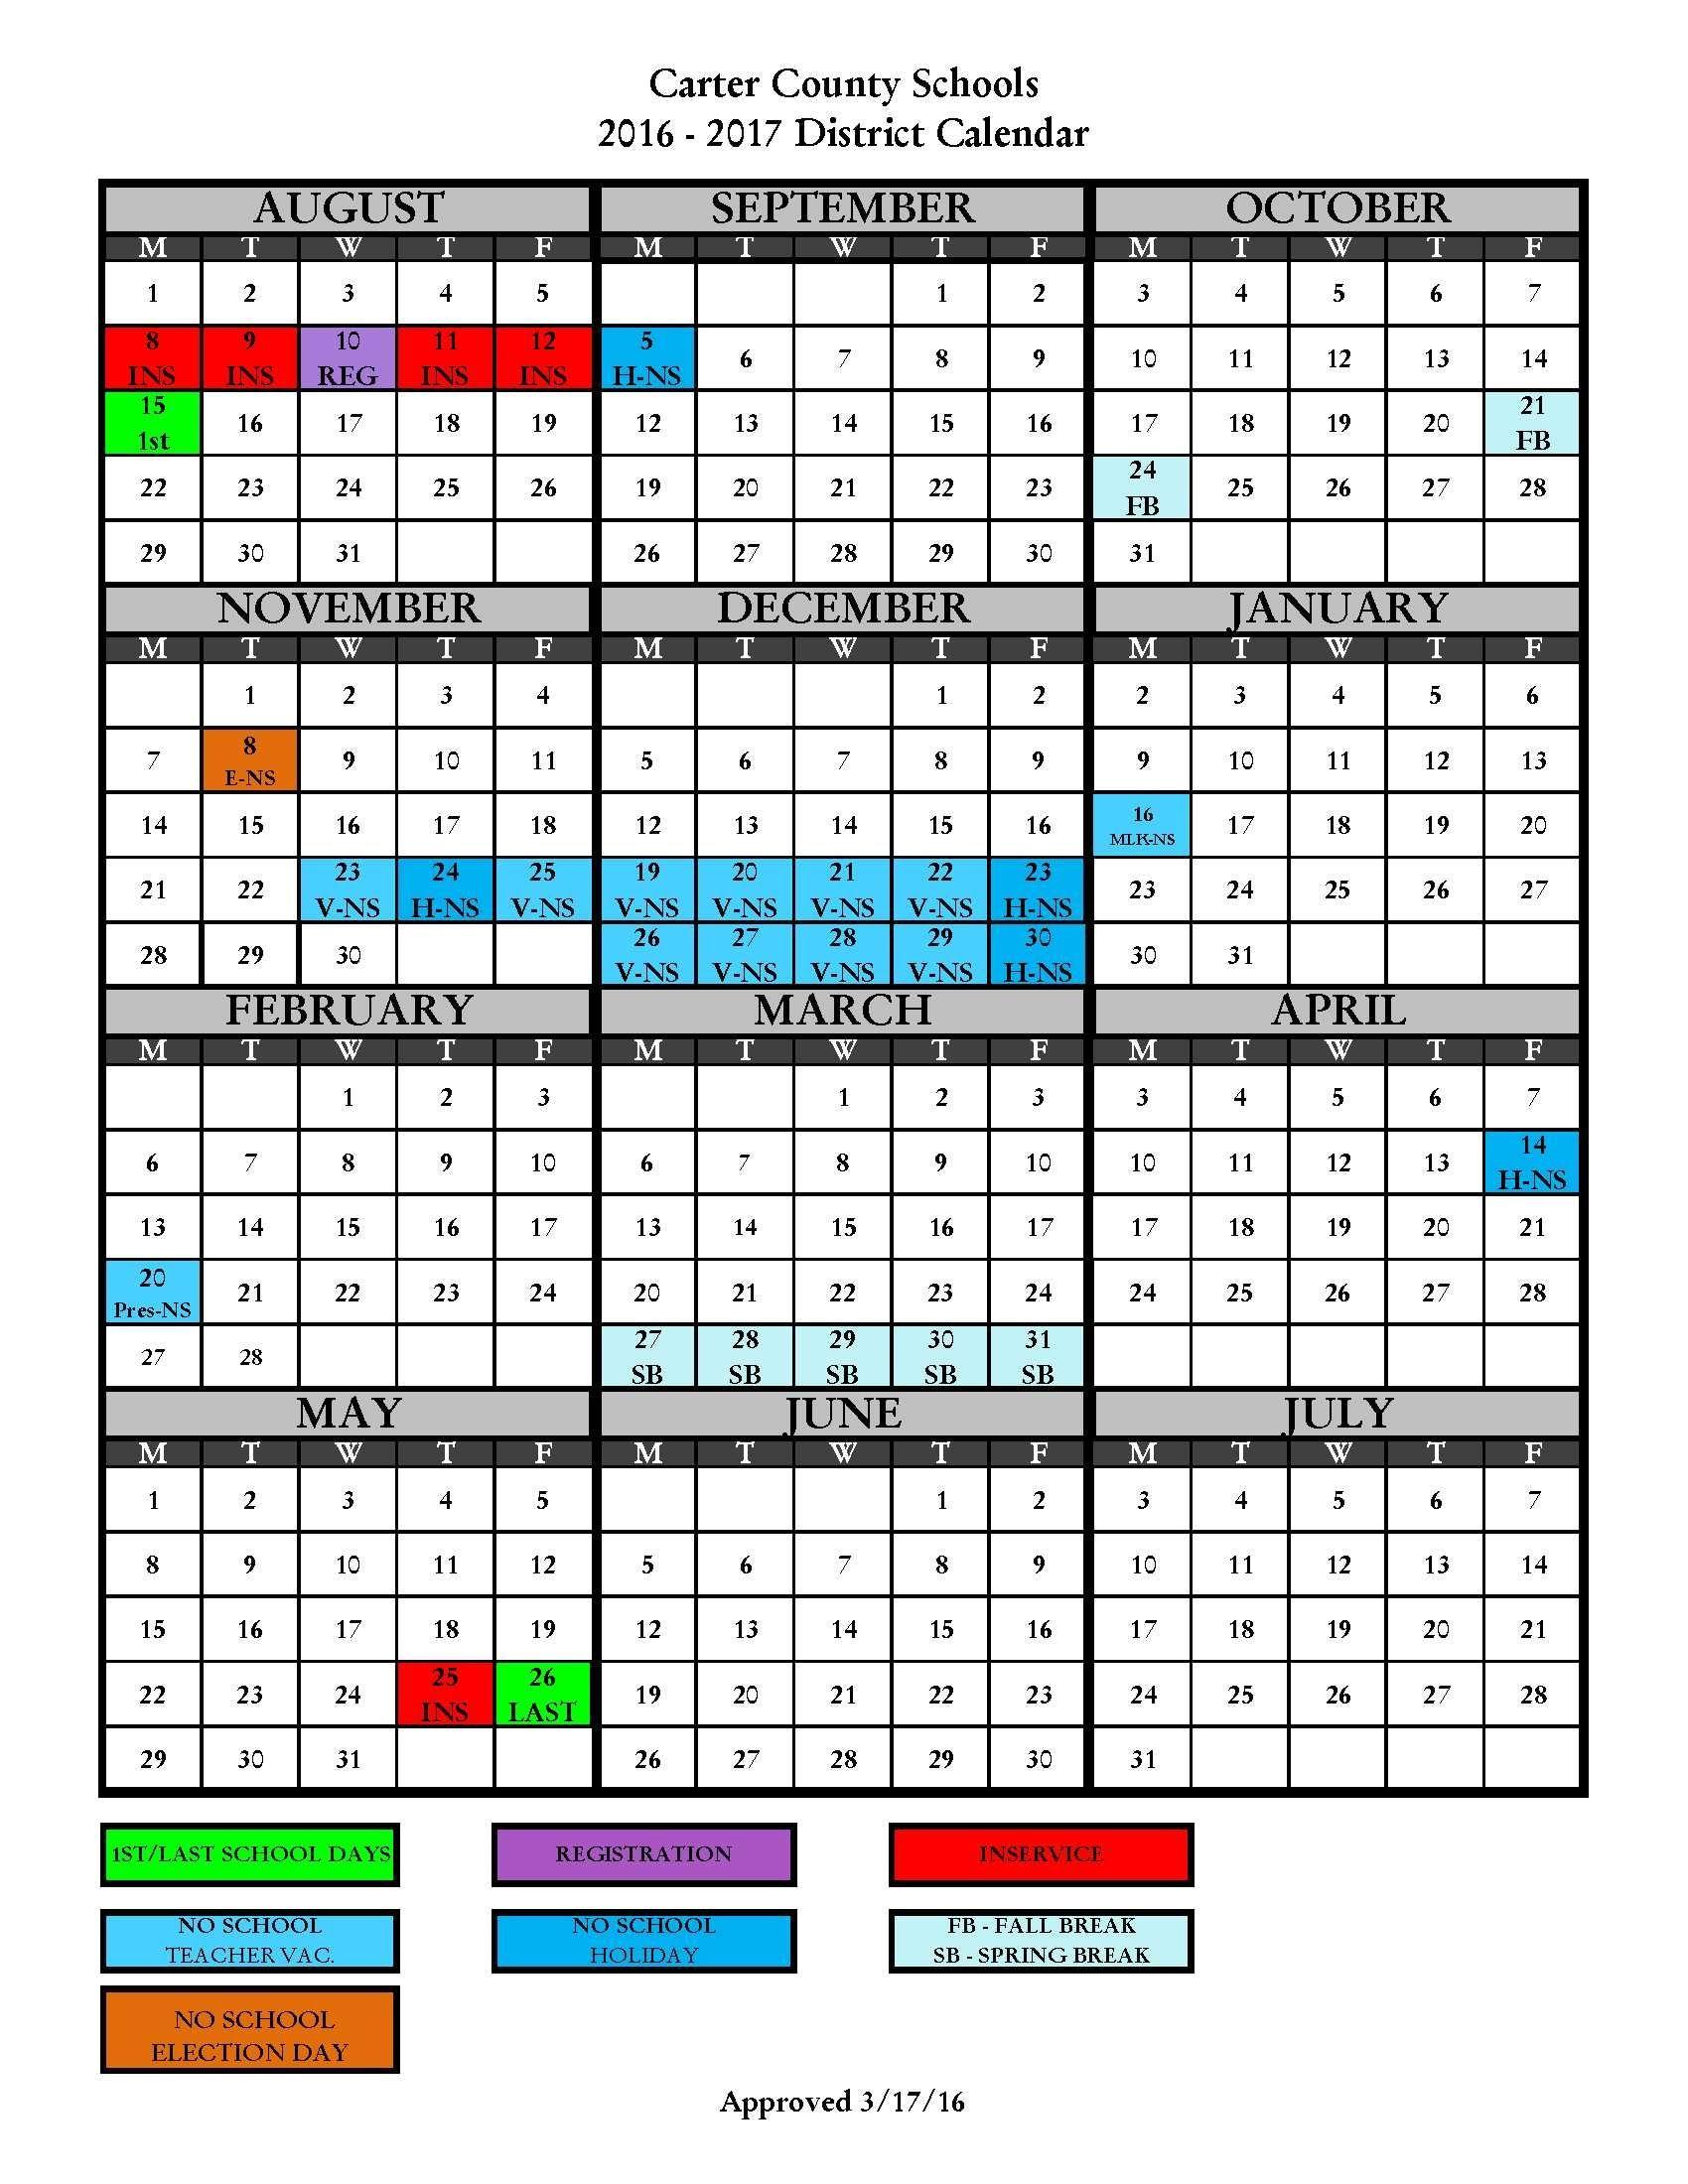 2016-2017 District Calendar - Carter County Schools | Carter county ...